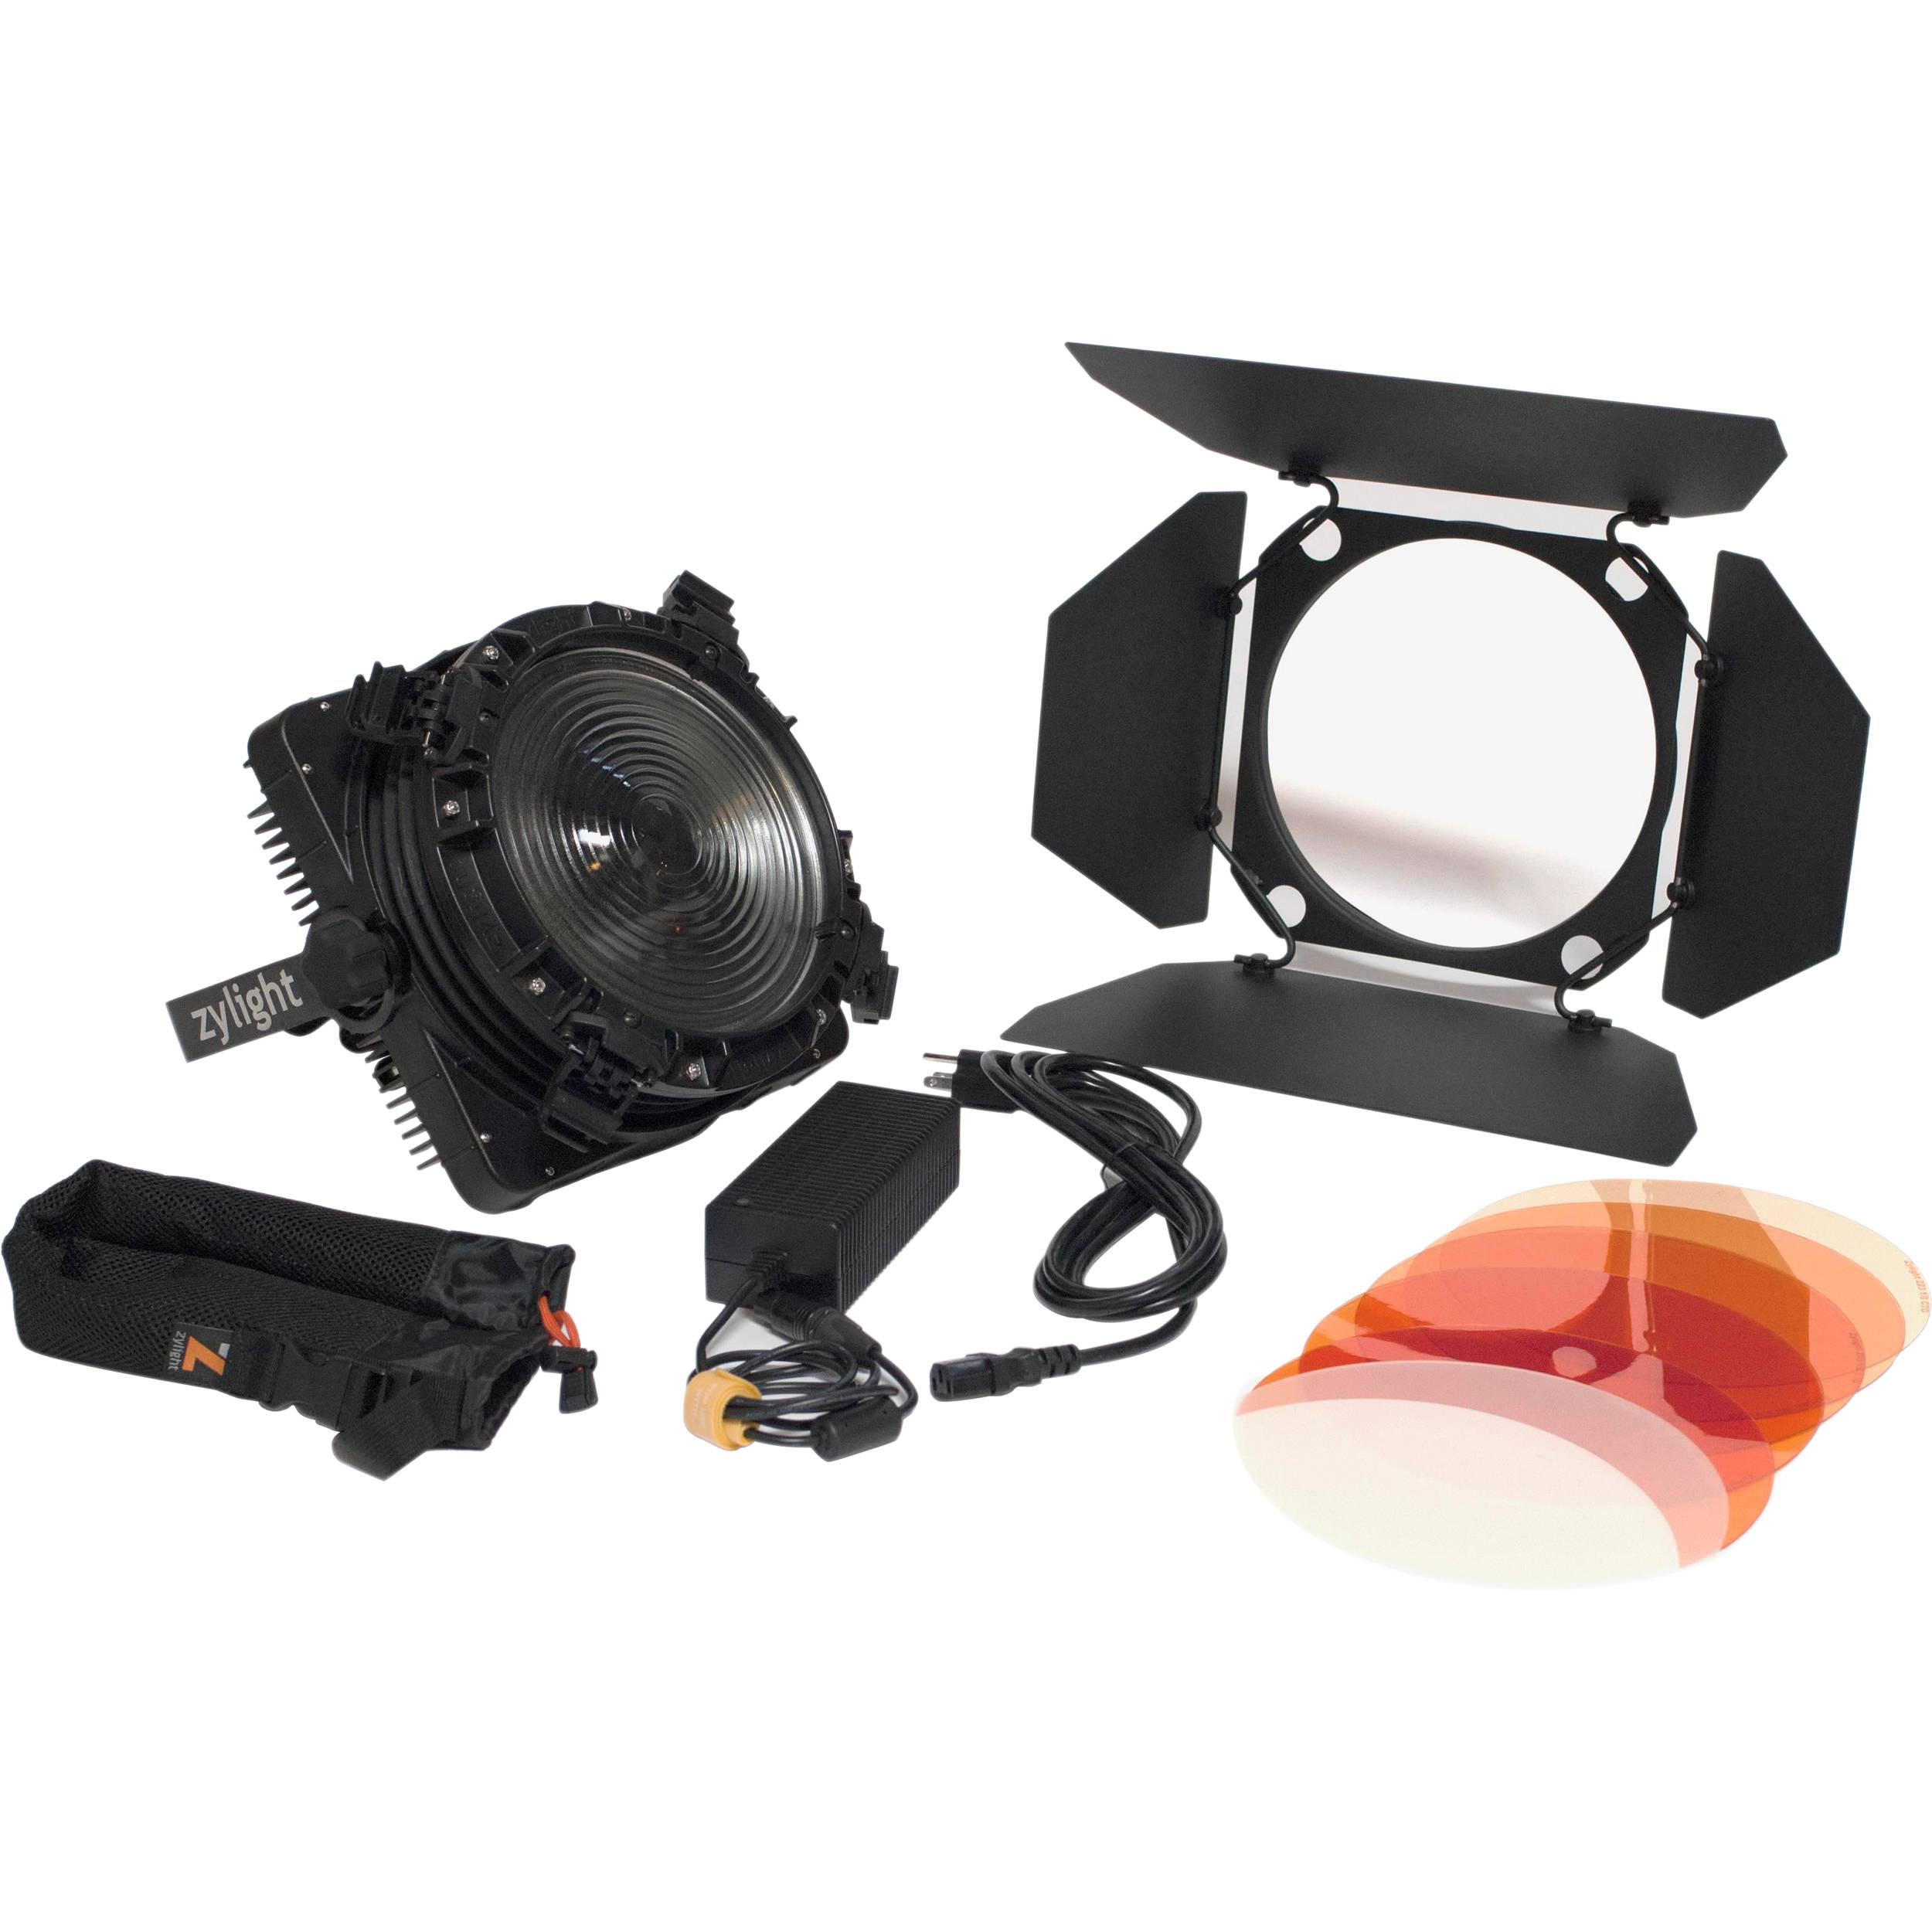 Zylight F8-D LED Fresnel Single Head ENG Kit with V-Mount (No Case)